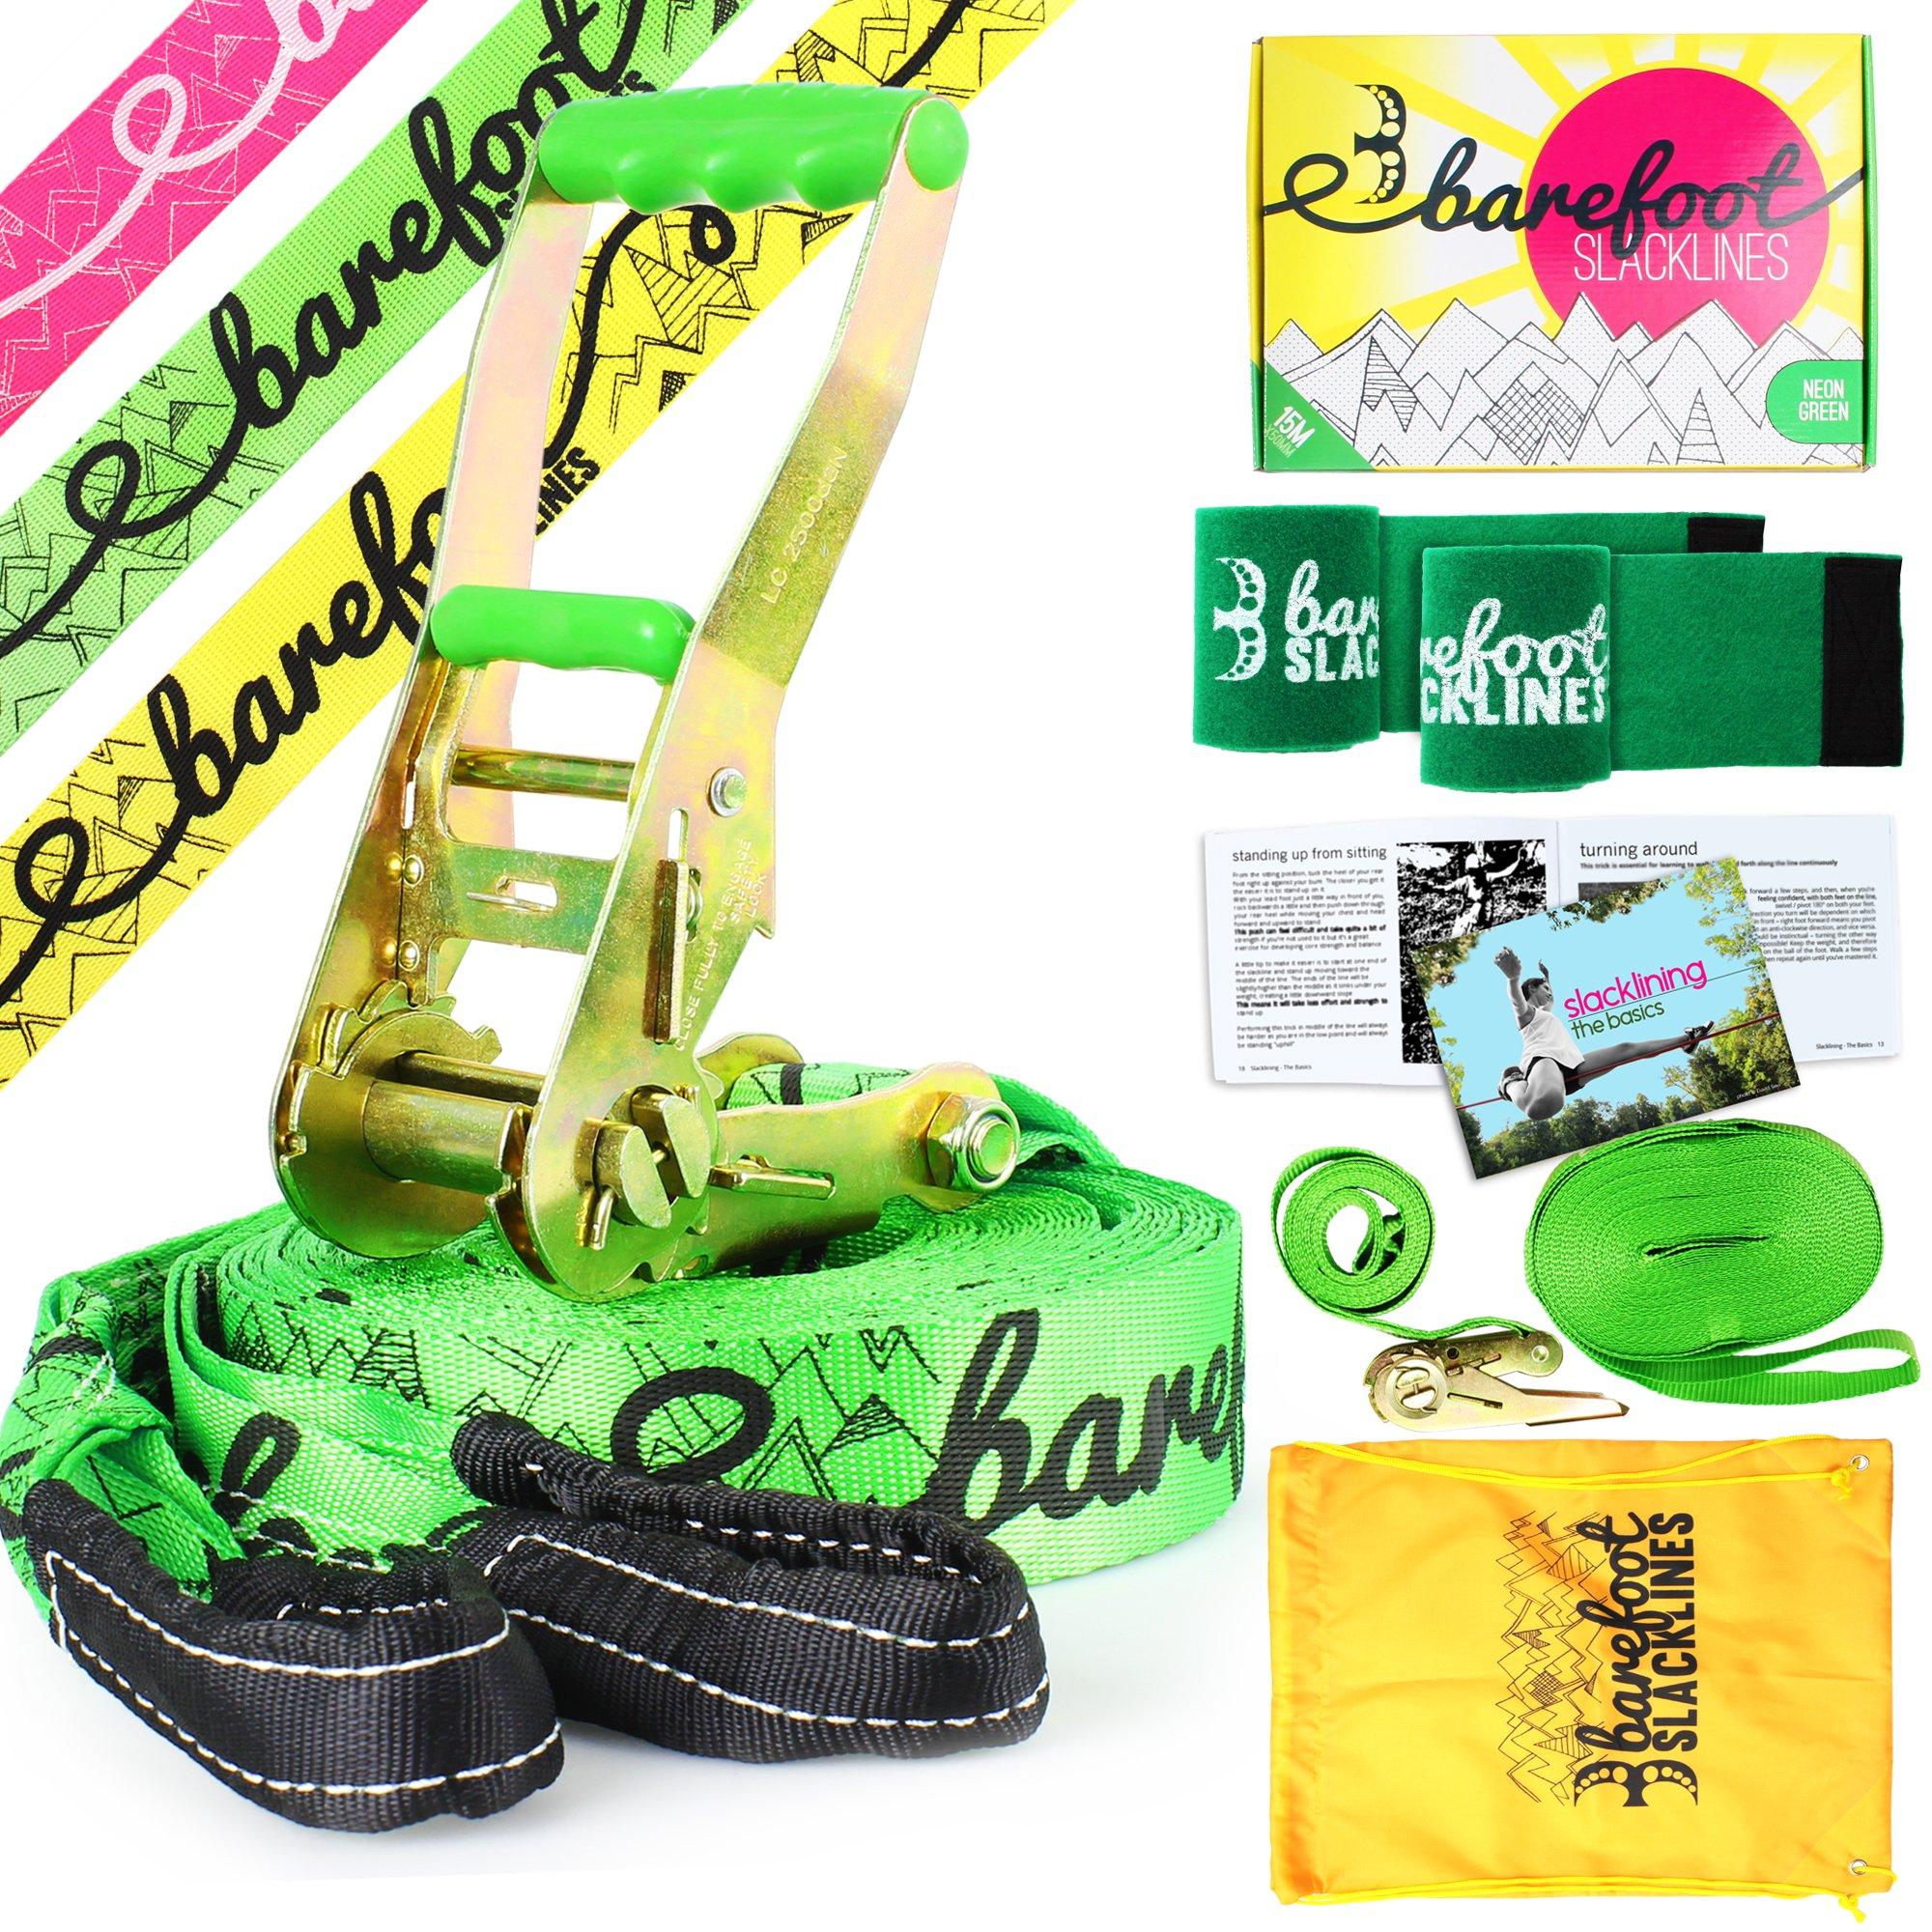 Barefoot Slacklines 49ft (15m) Line! Complete Set Including Slackline, Ratchet, Training Line, Bark Protectors & Instructions! Great for Kids and Family, 3 Fluro Colours Available (Fluro Green) by Barefoot Slacklines